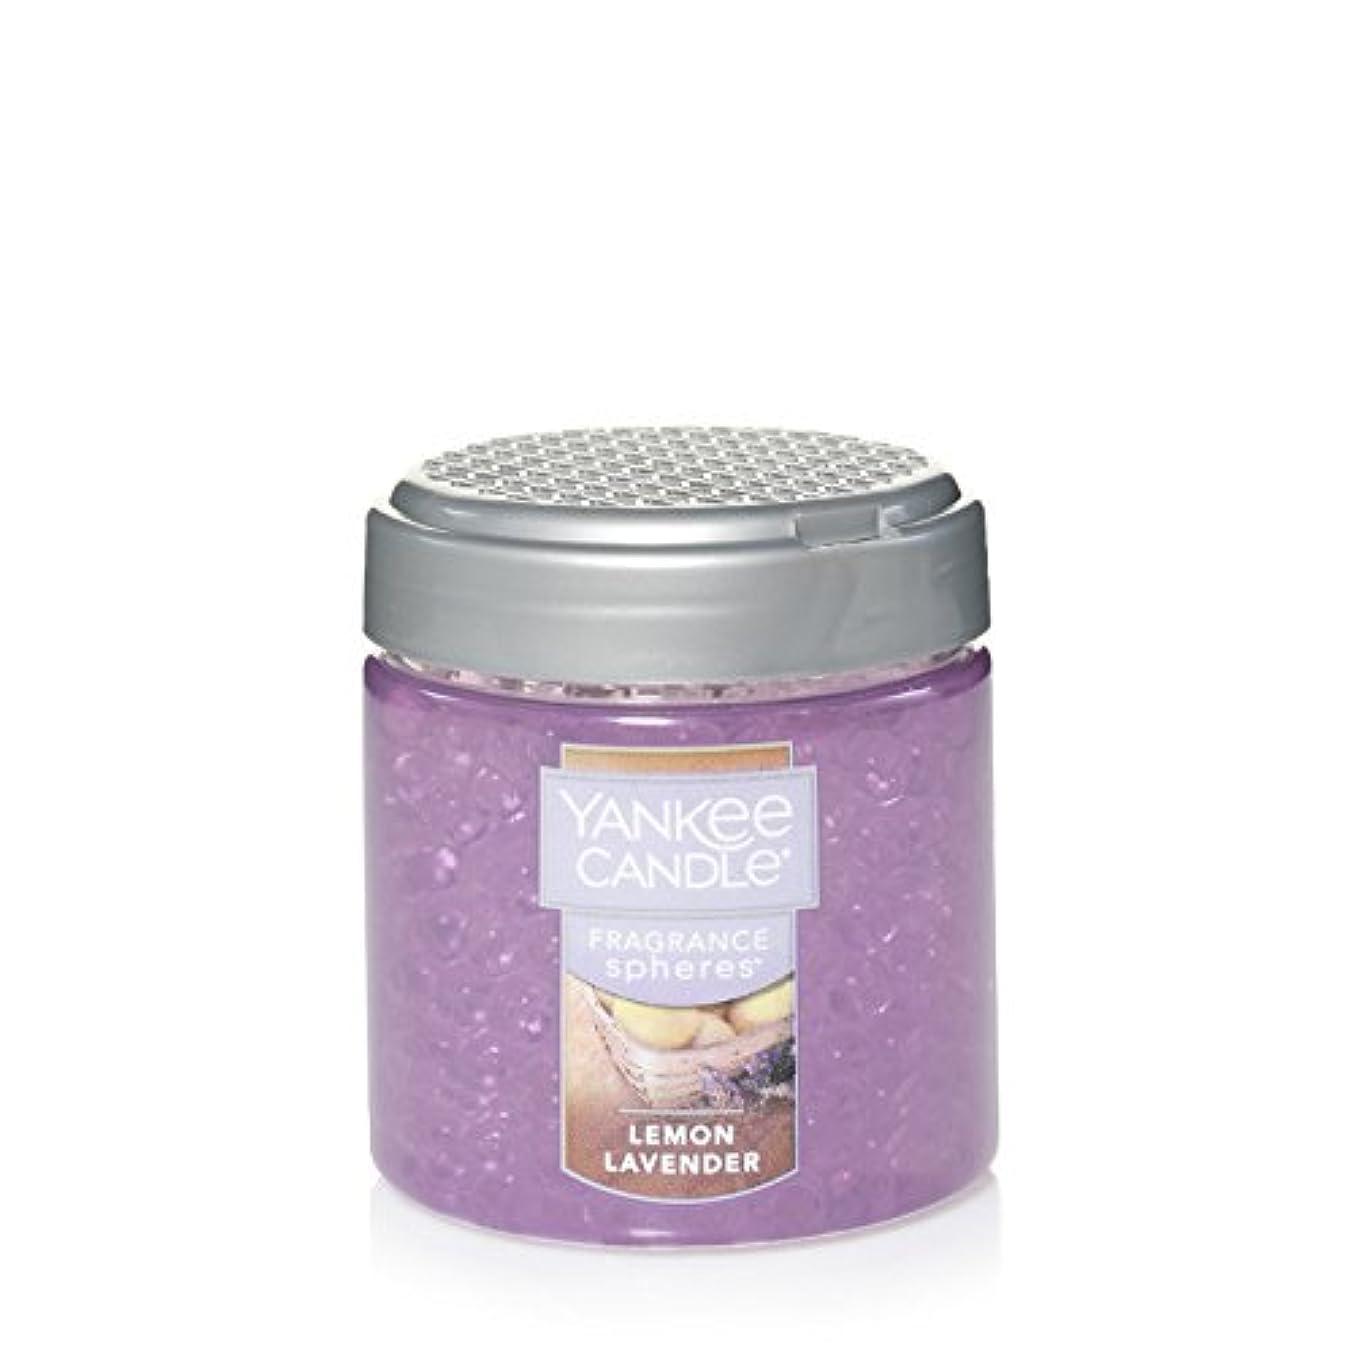 Yankee Candle Fragrance Spheres, Lemon Lavender